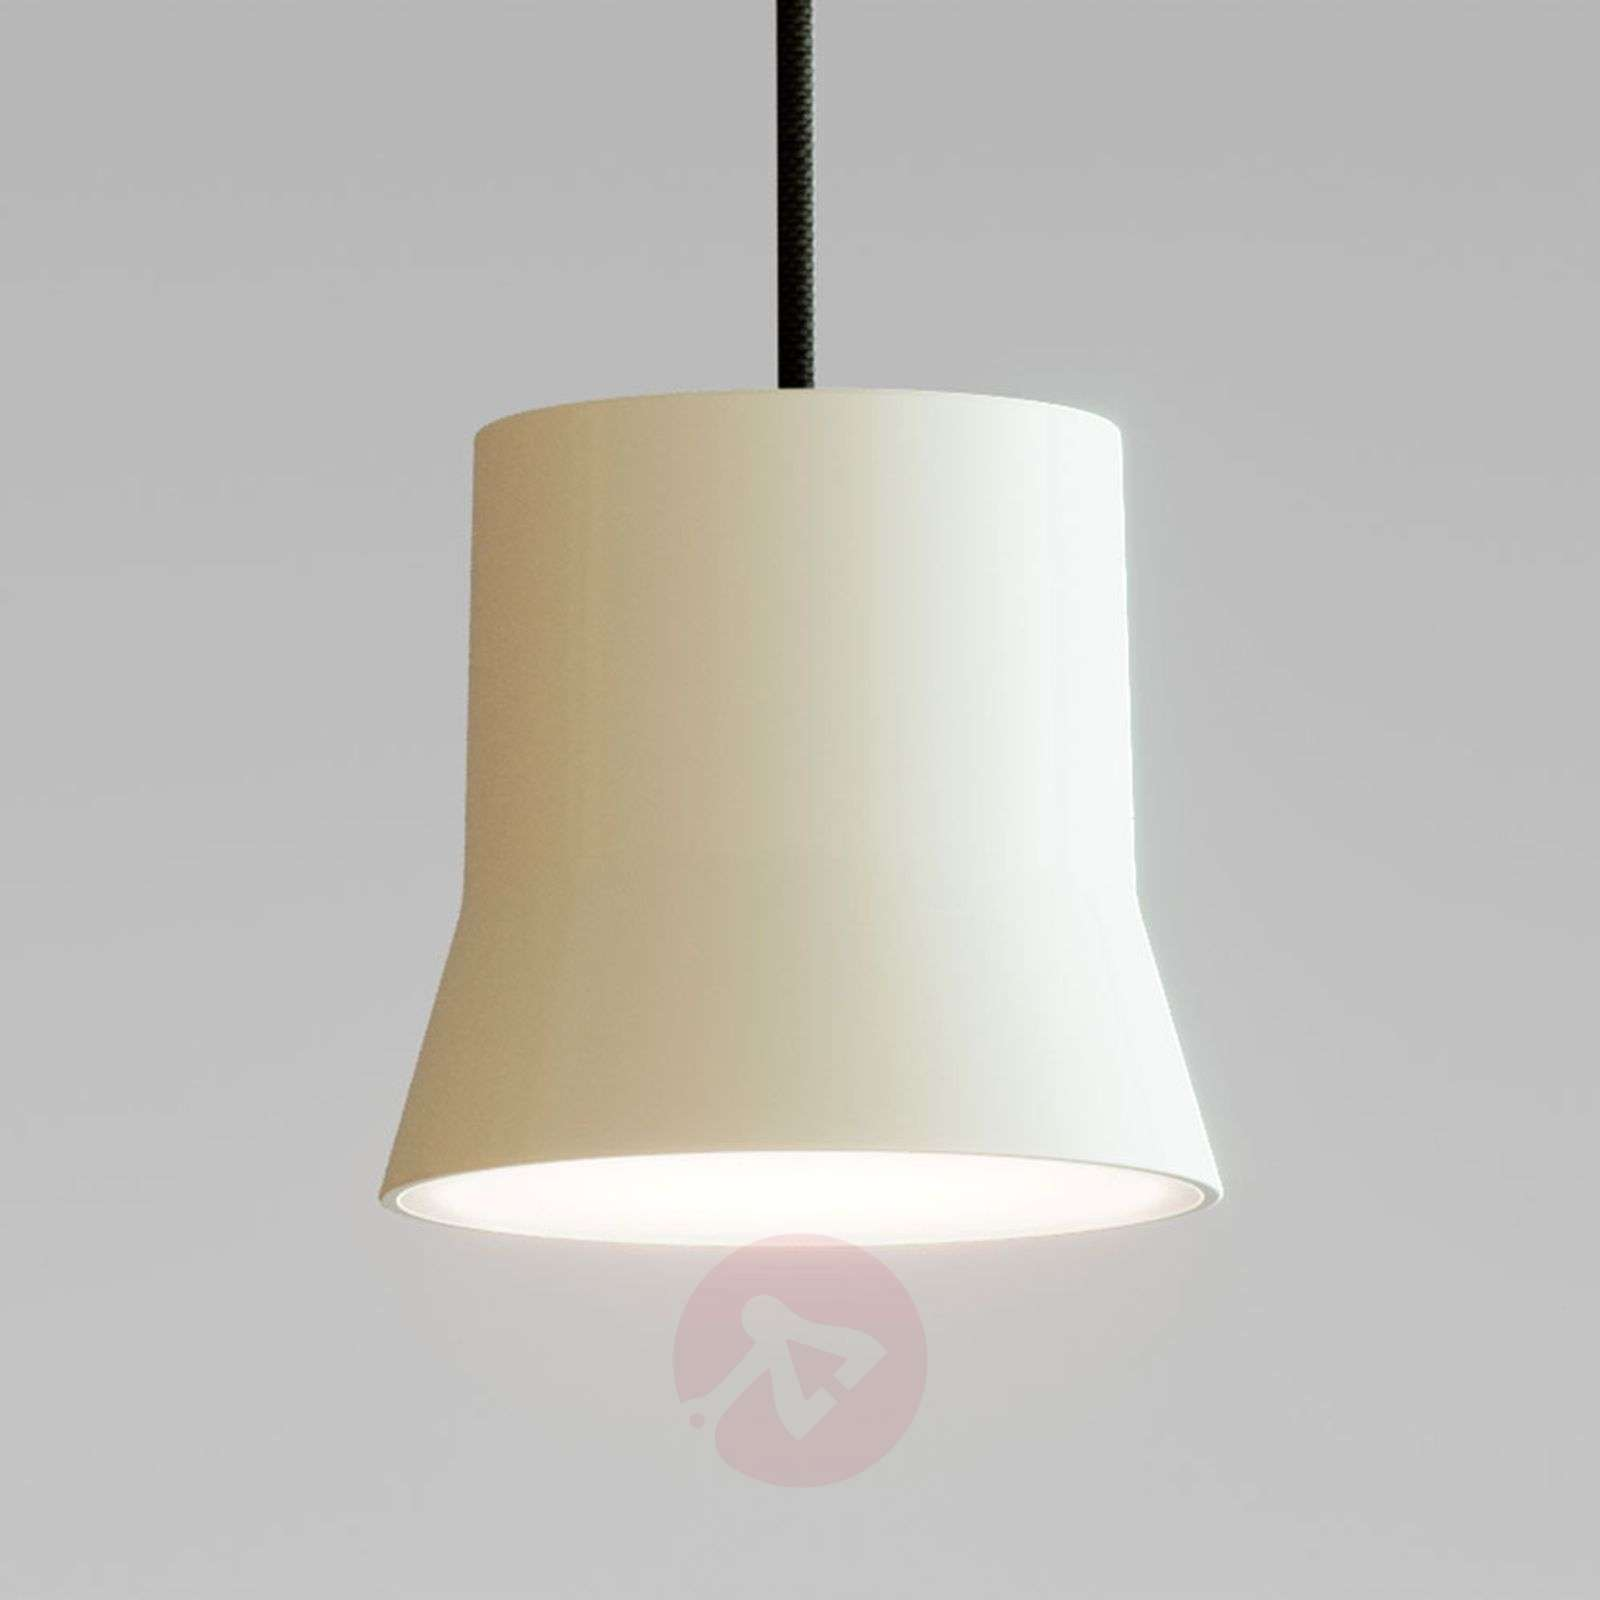 Artemide GIO.light LED-riippuvalo-1060298X-01